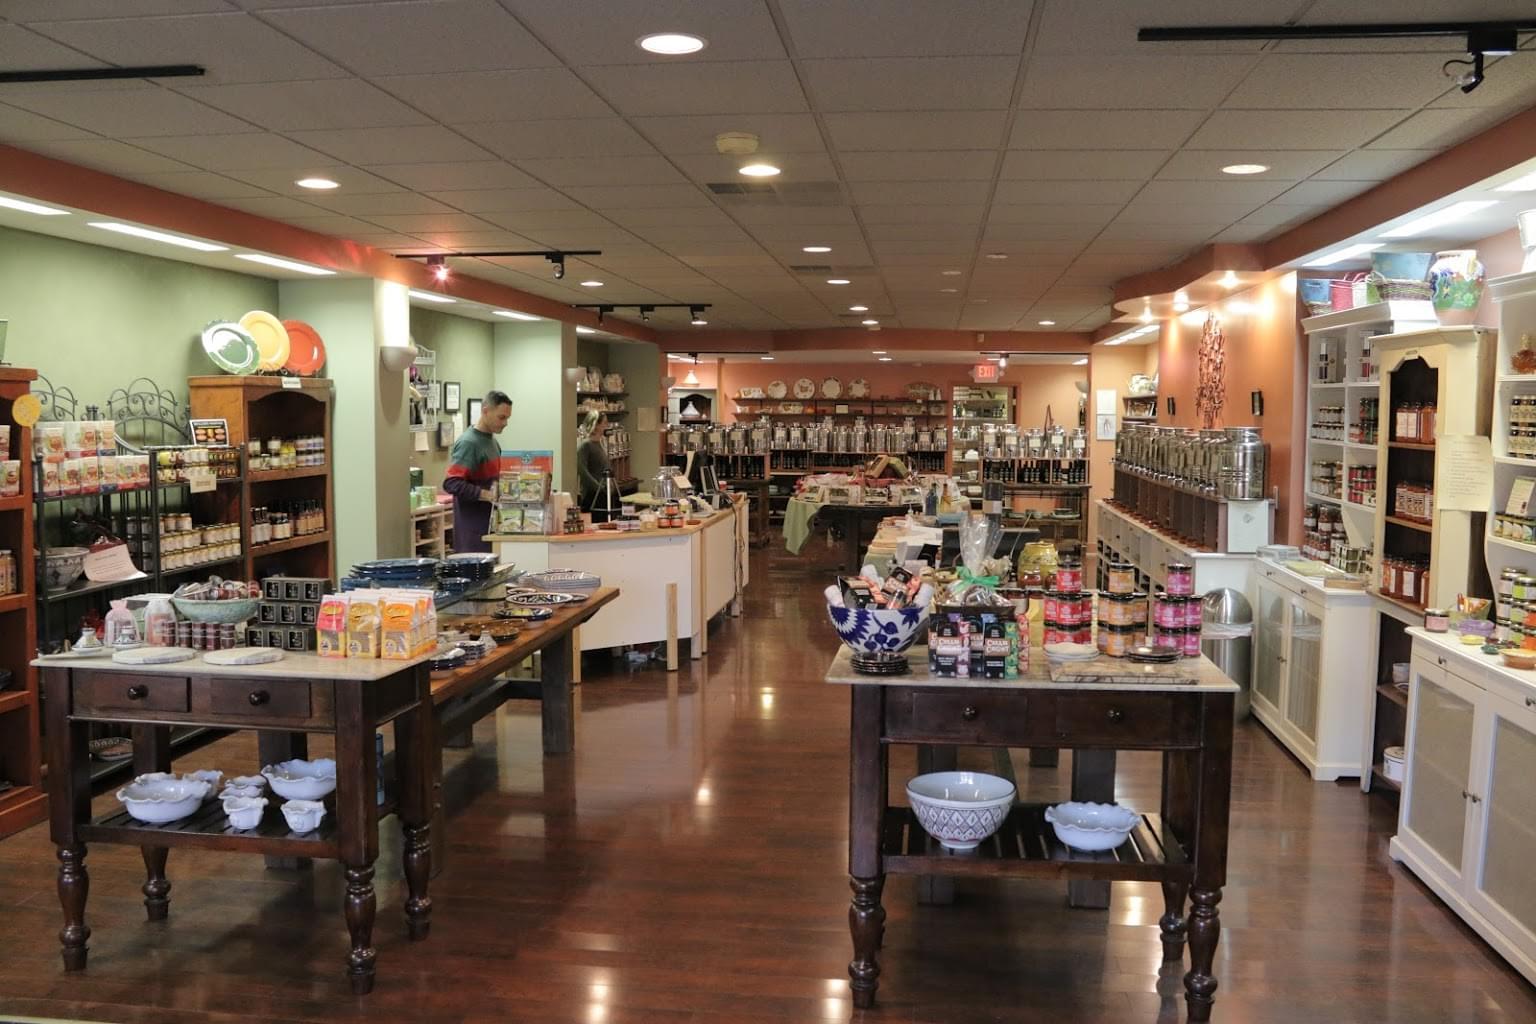 A Taste of Olive, Haddonfield NJ – See-Inside Health Food Store